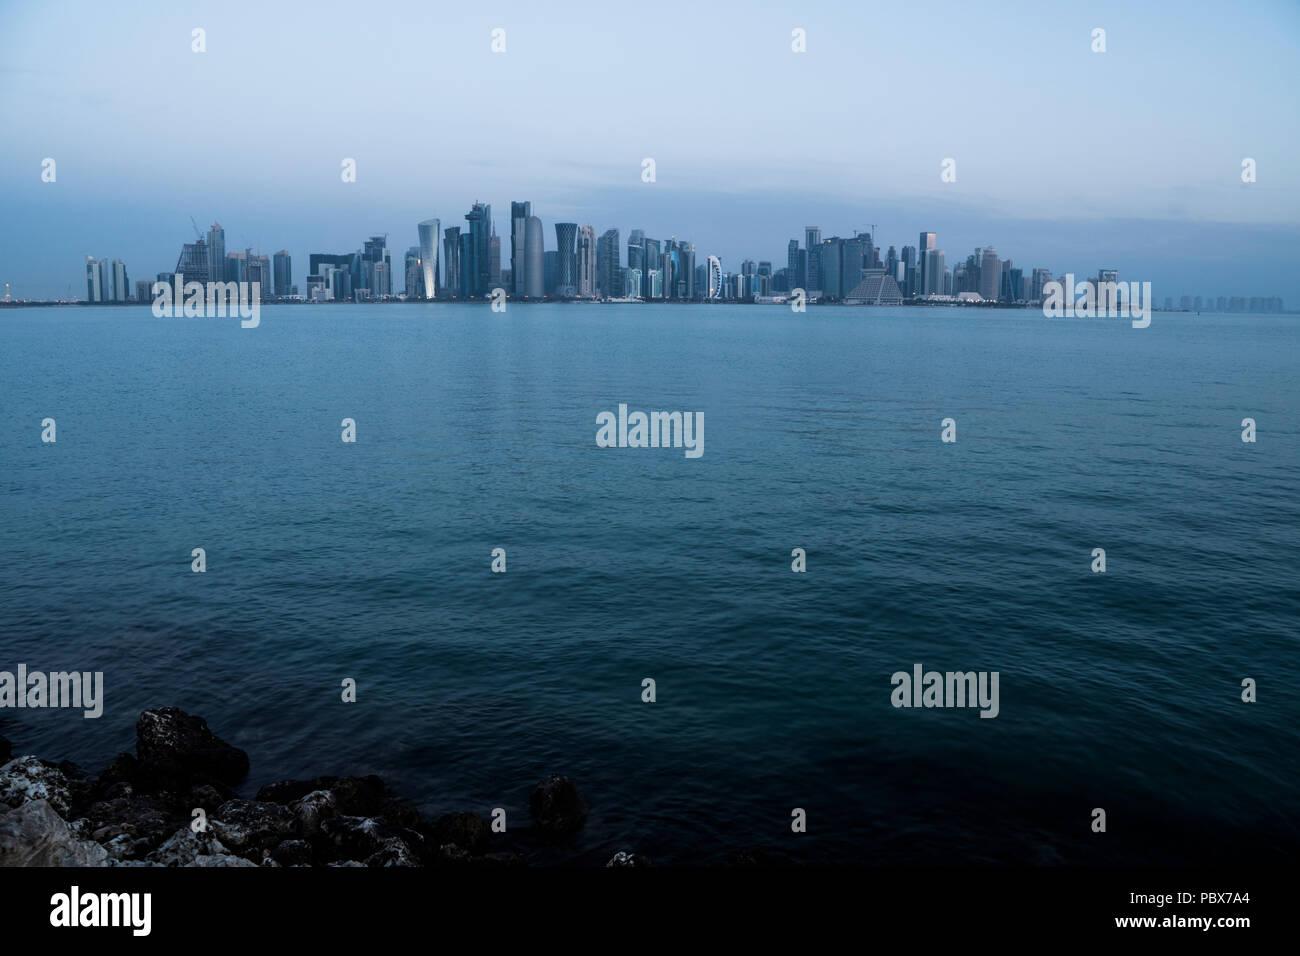 Morning Twilight Doha Skyline View. Qatar, Middle East - Stock Image